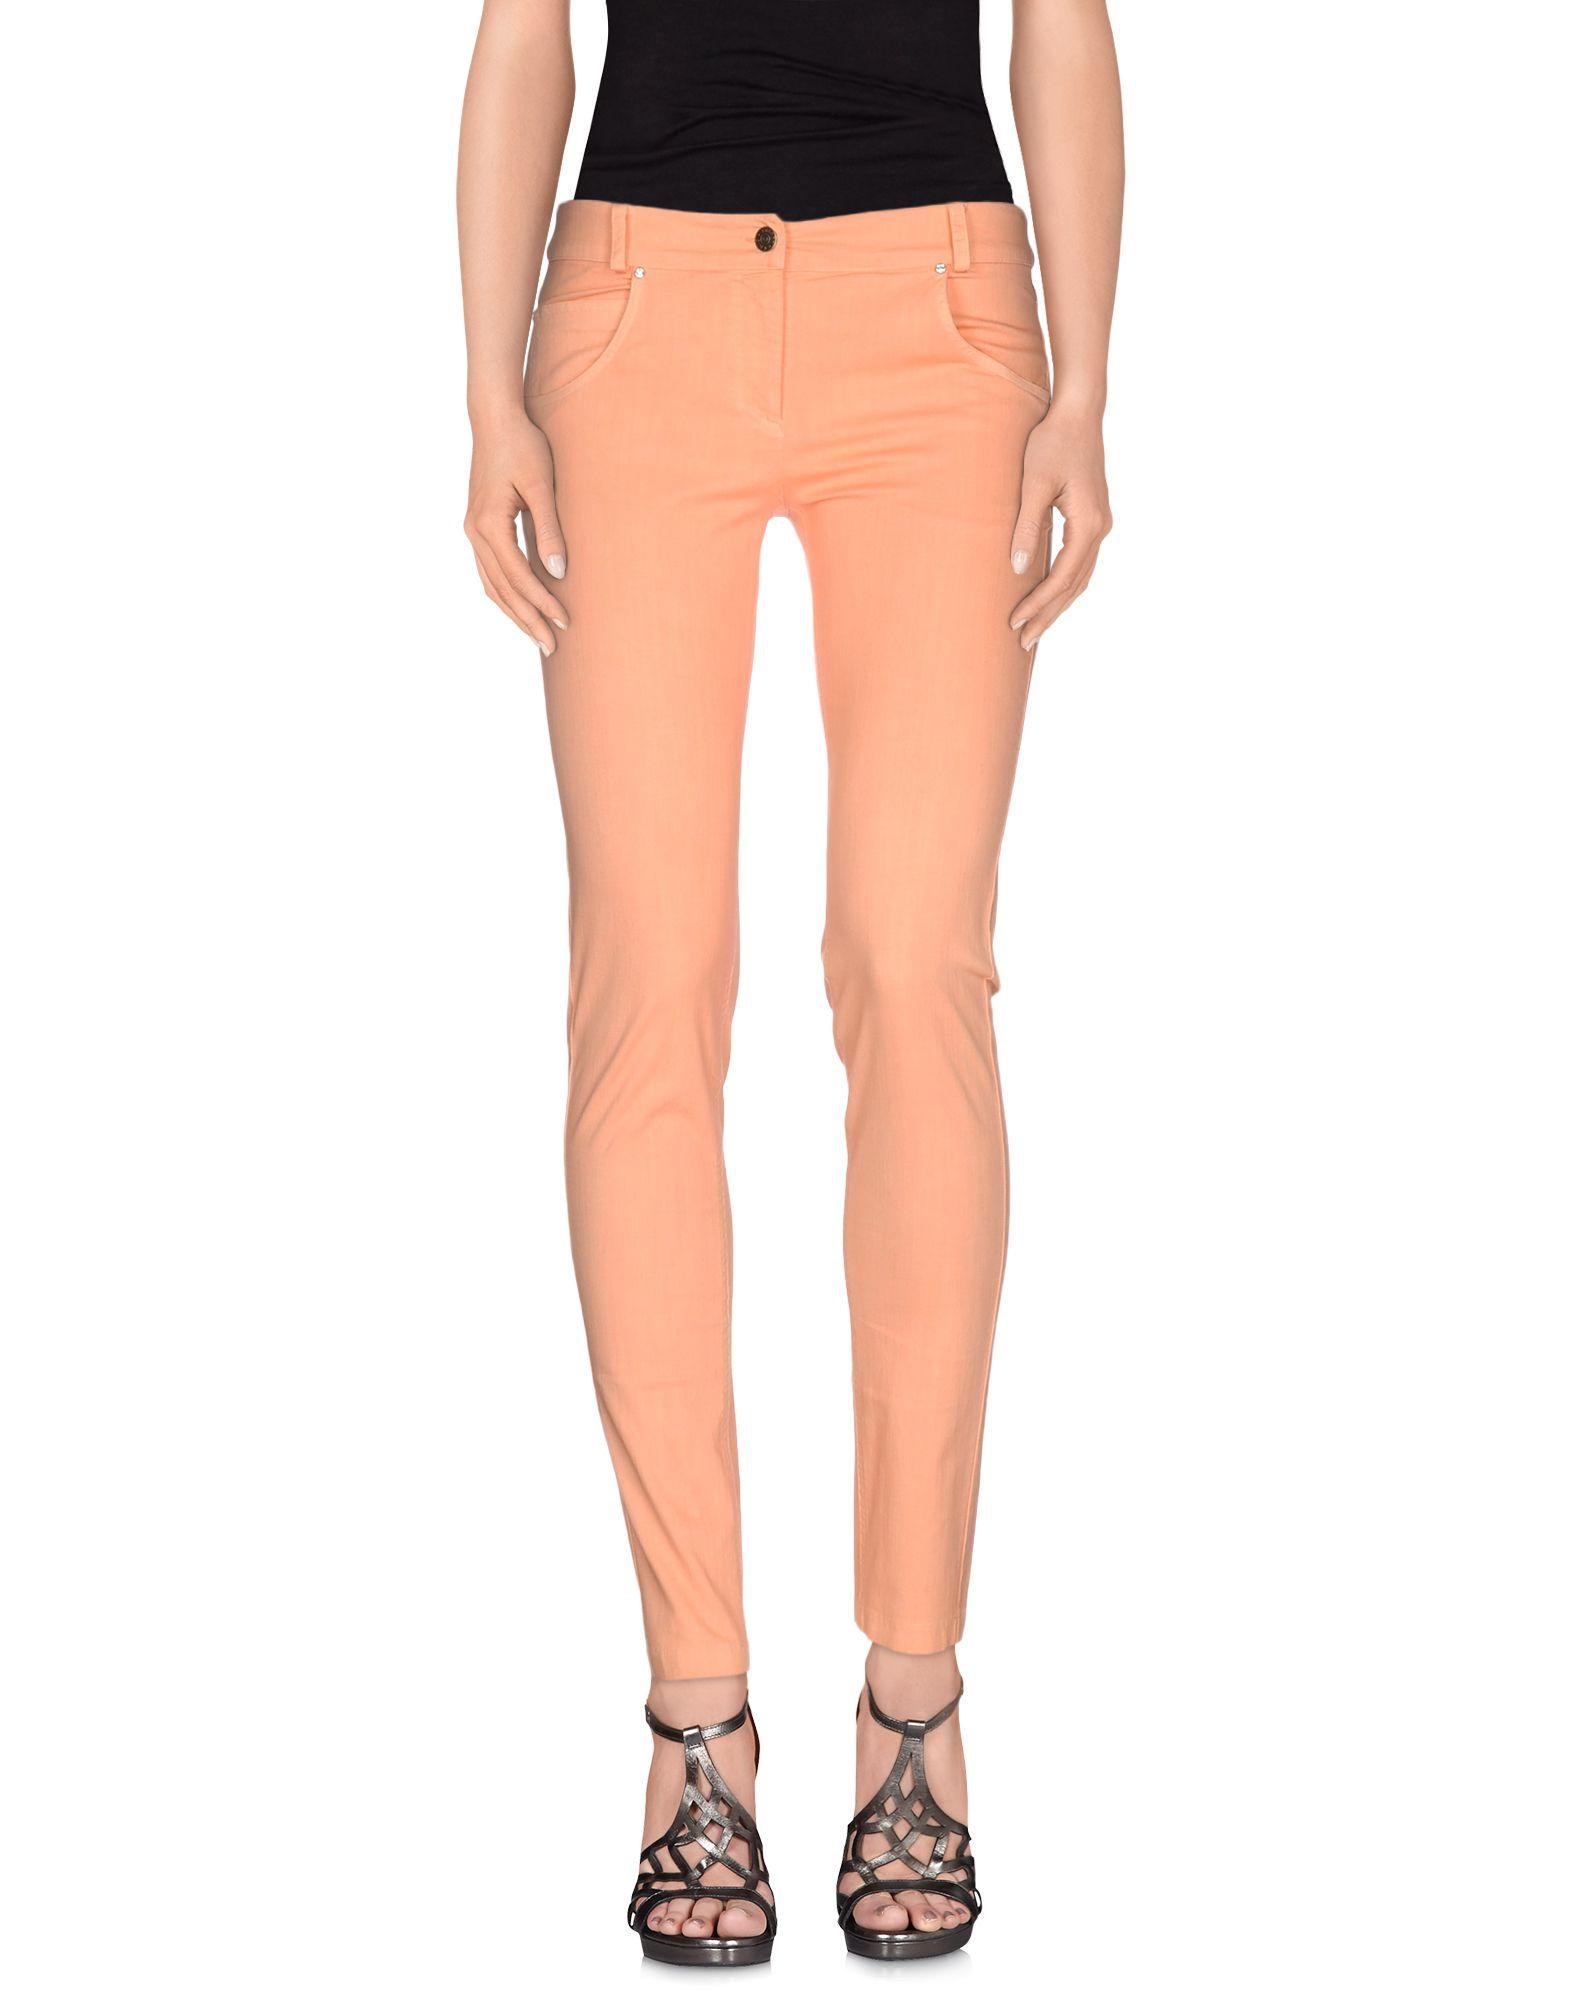 TRICOT CHIC Джинсовые брюки